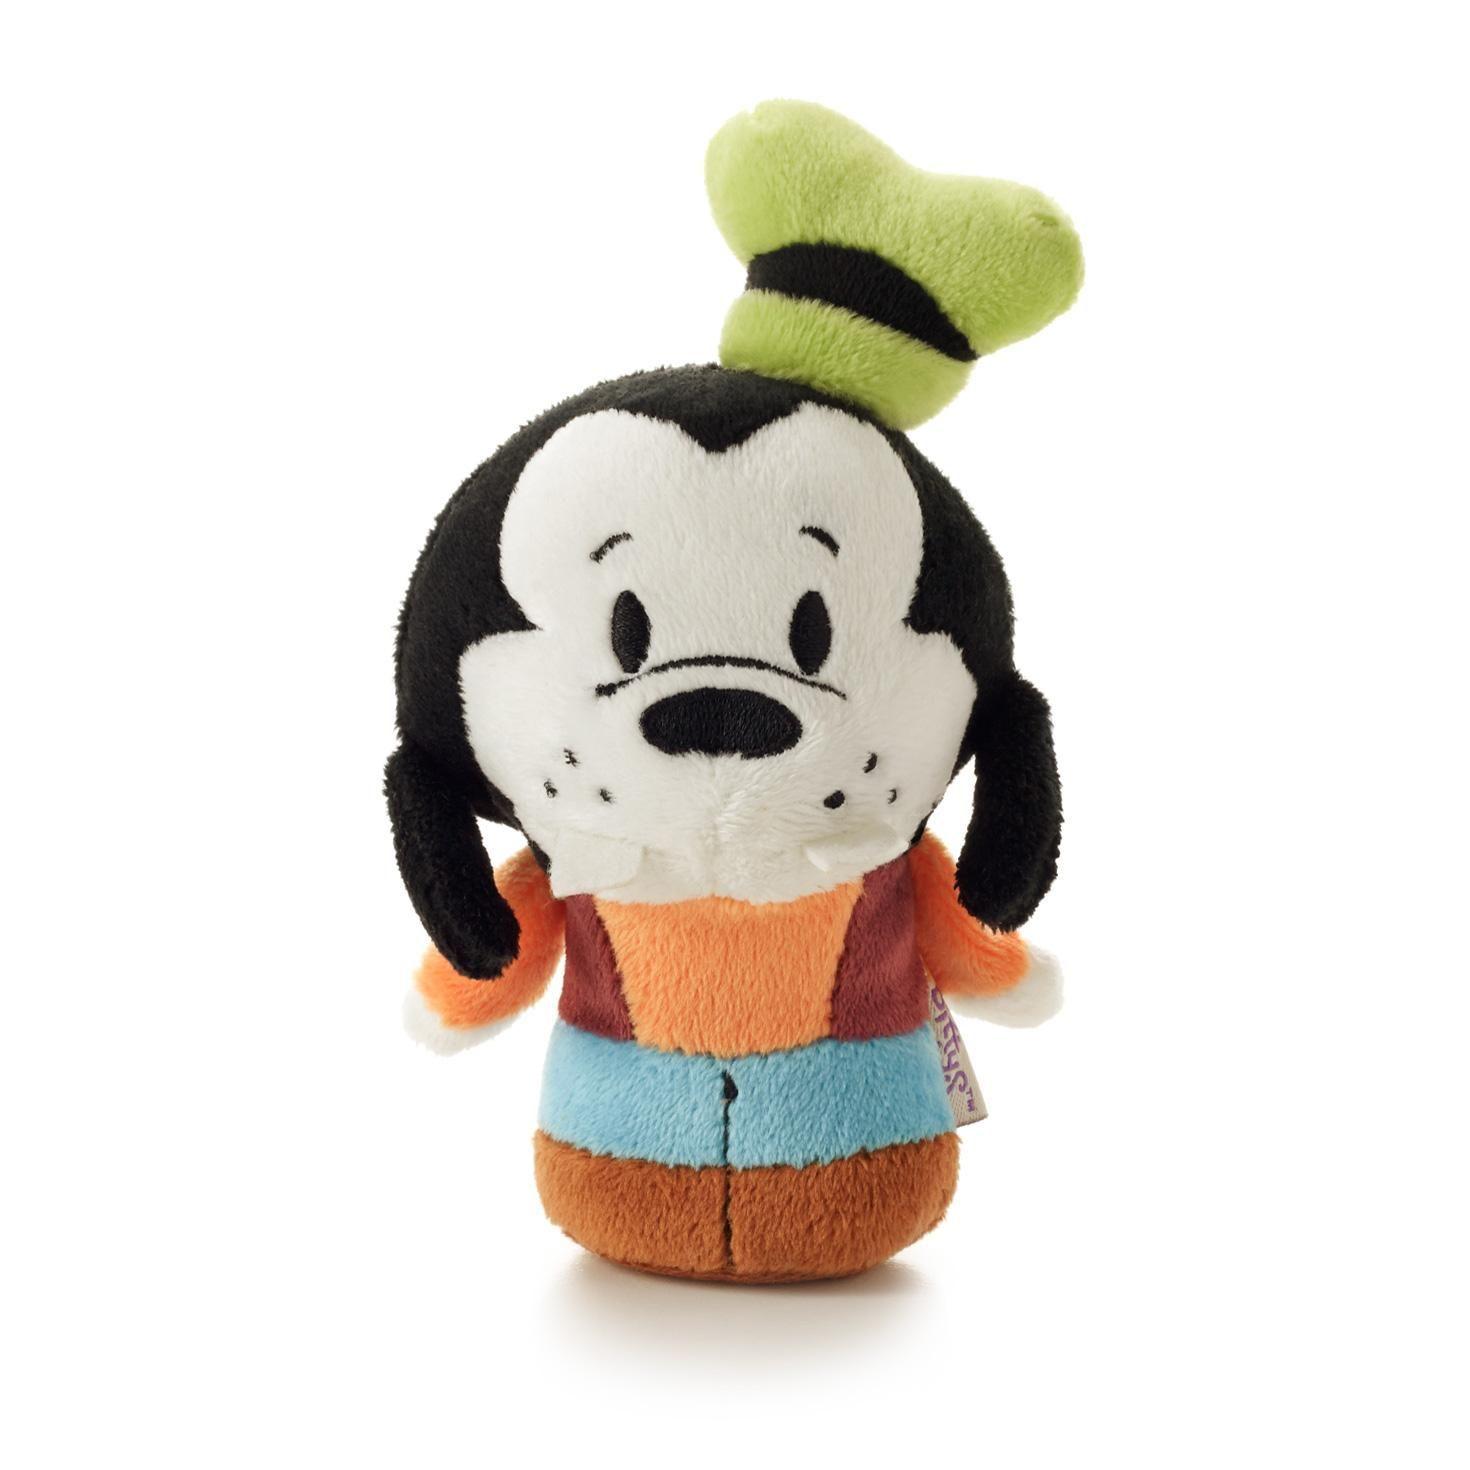 itty bittys® Goofy - Anytime Gifts - Hallmark